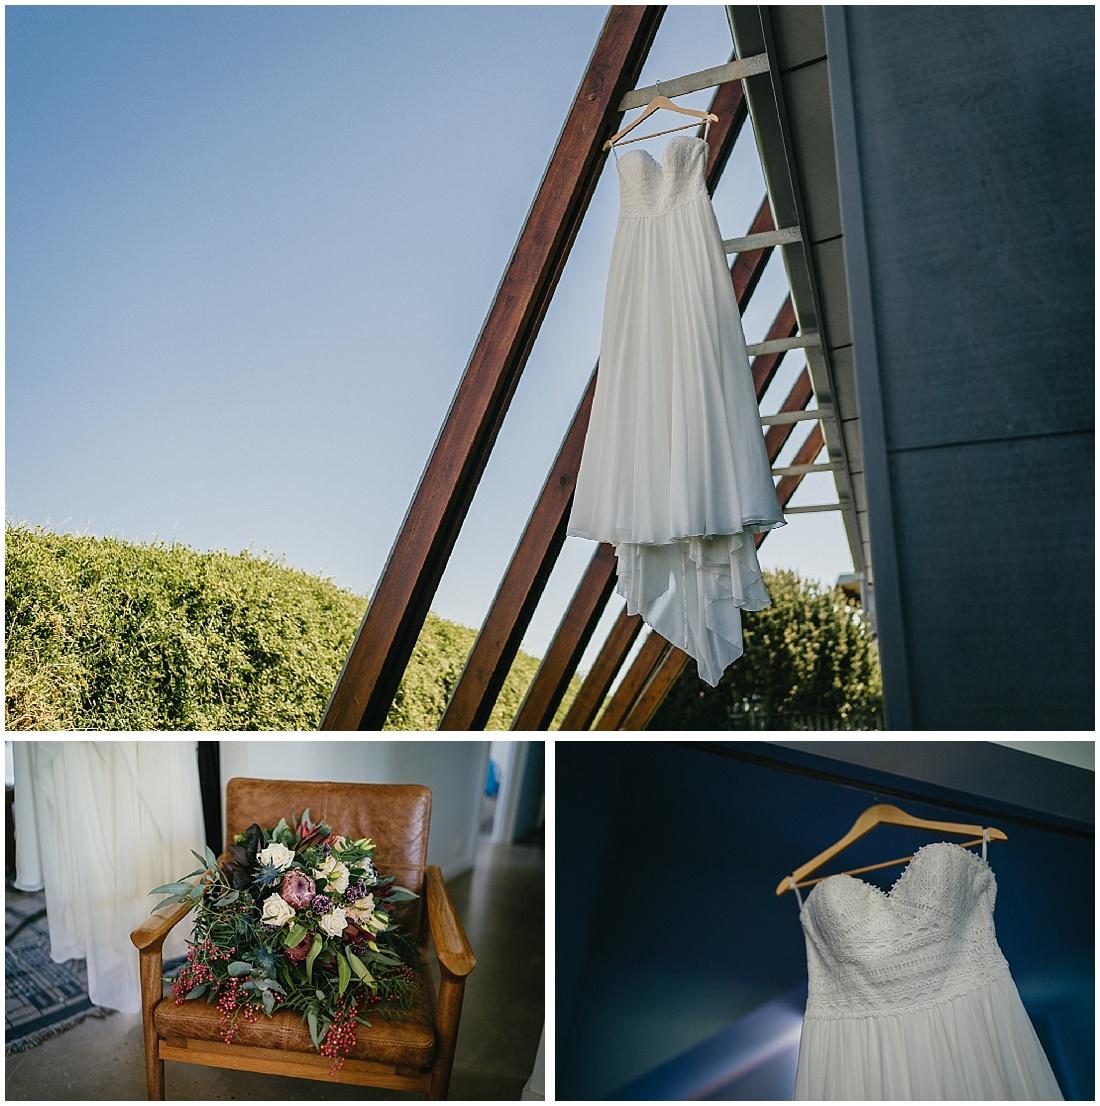 phillip island melbourne wedding photography_006.jpg